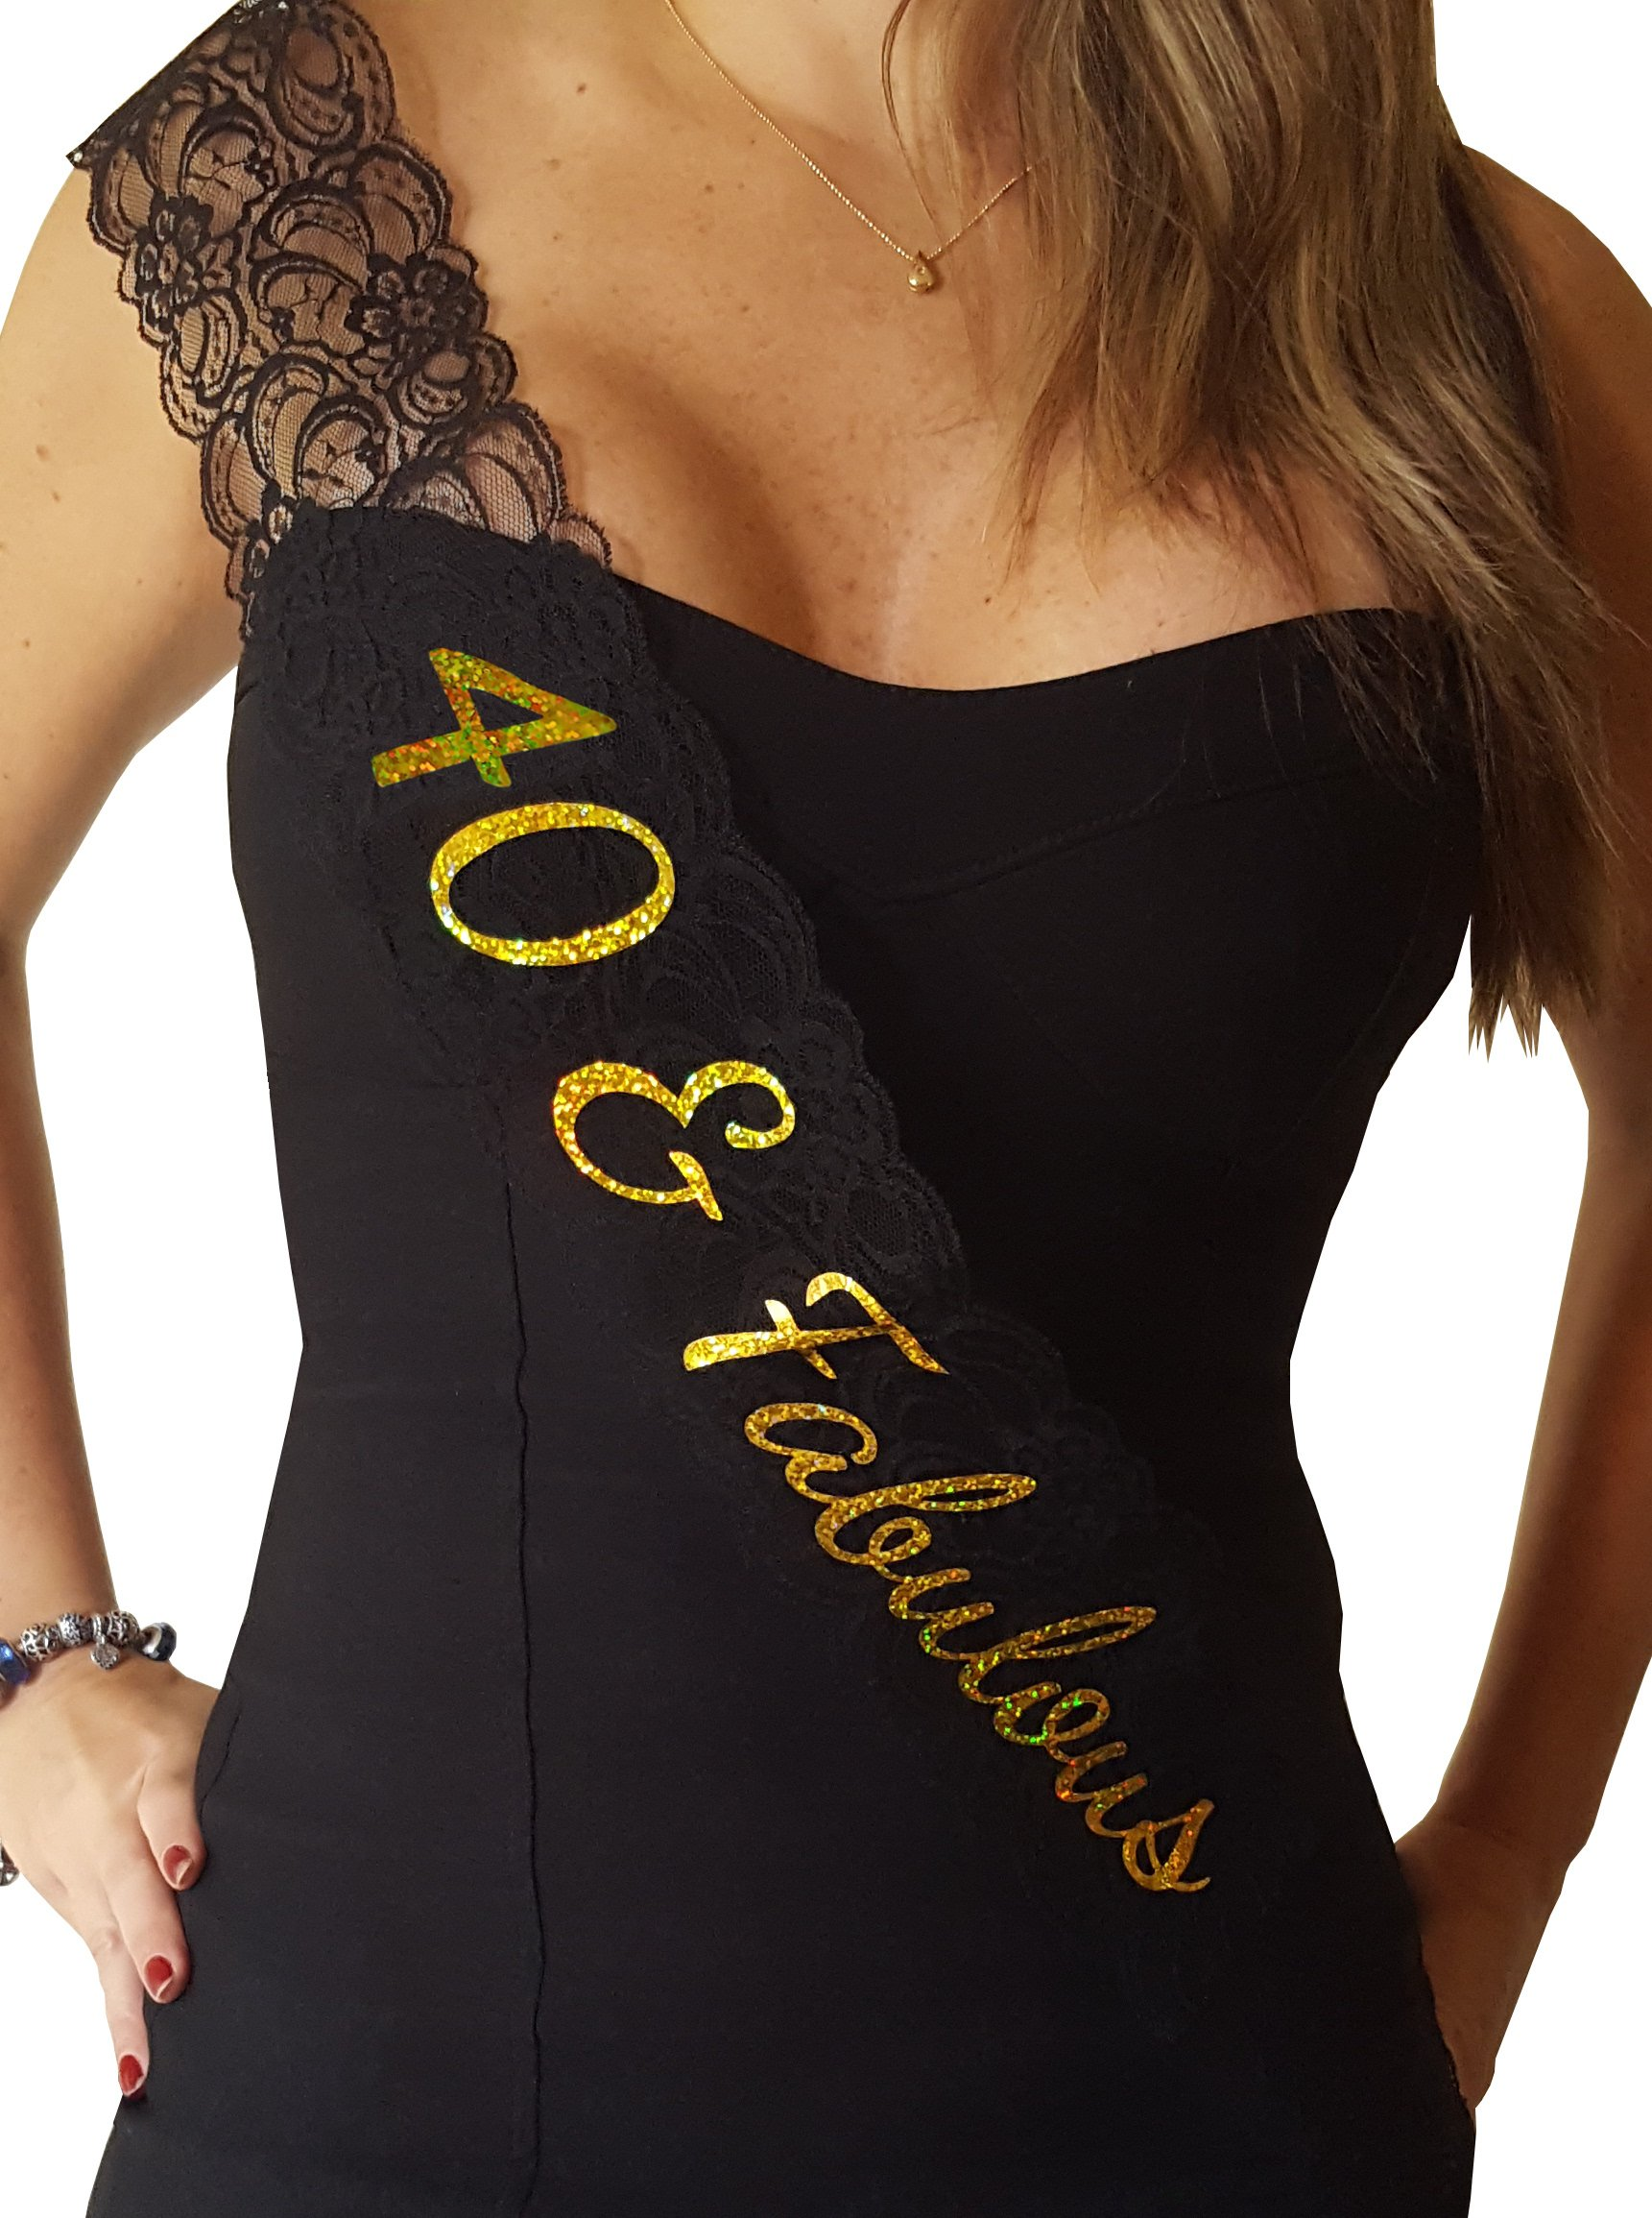 40 & Fabulous Lace Sash - 40th Birthday Sash - Great Birthday Decoration or Photo Prop